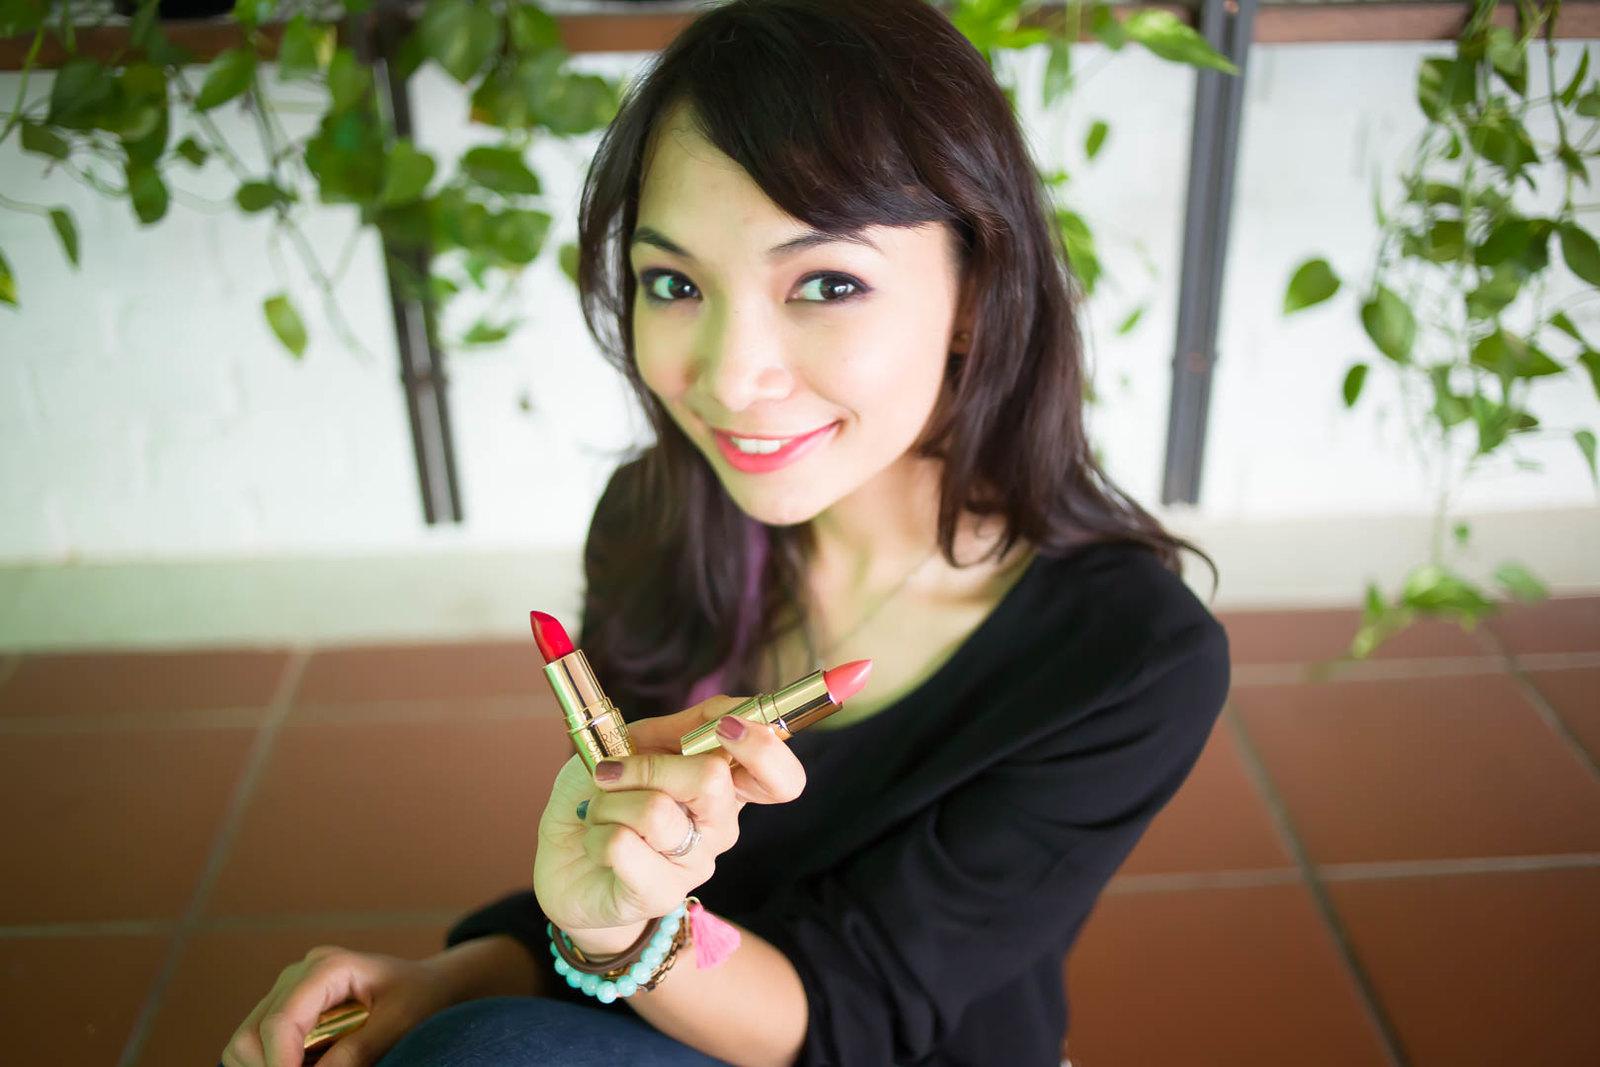 gerard cosmetics lipstick 3